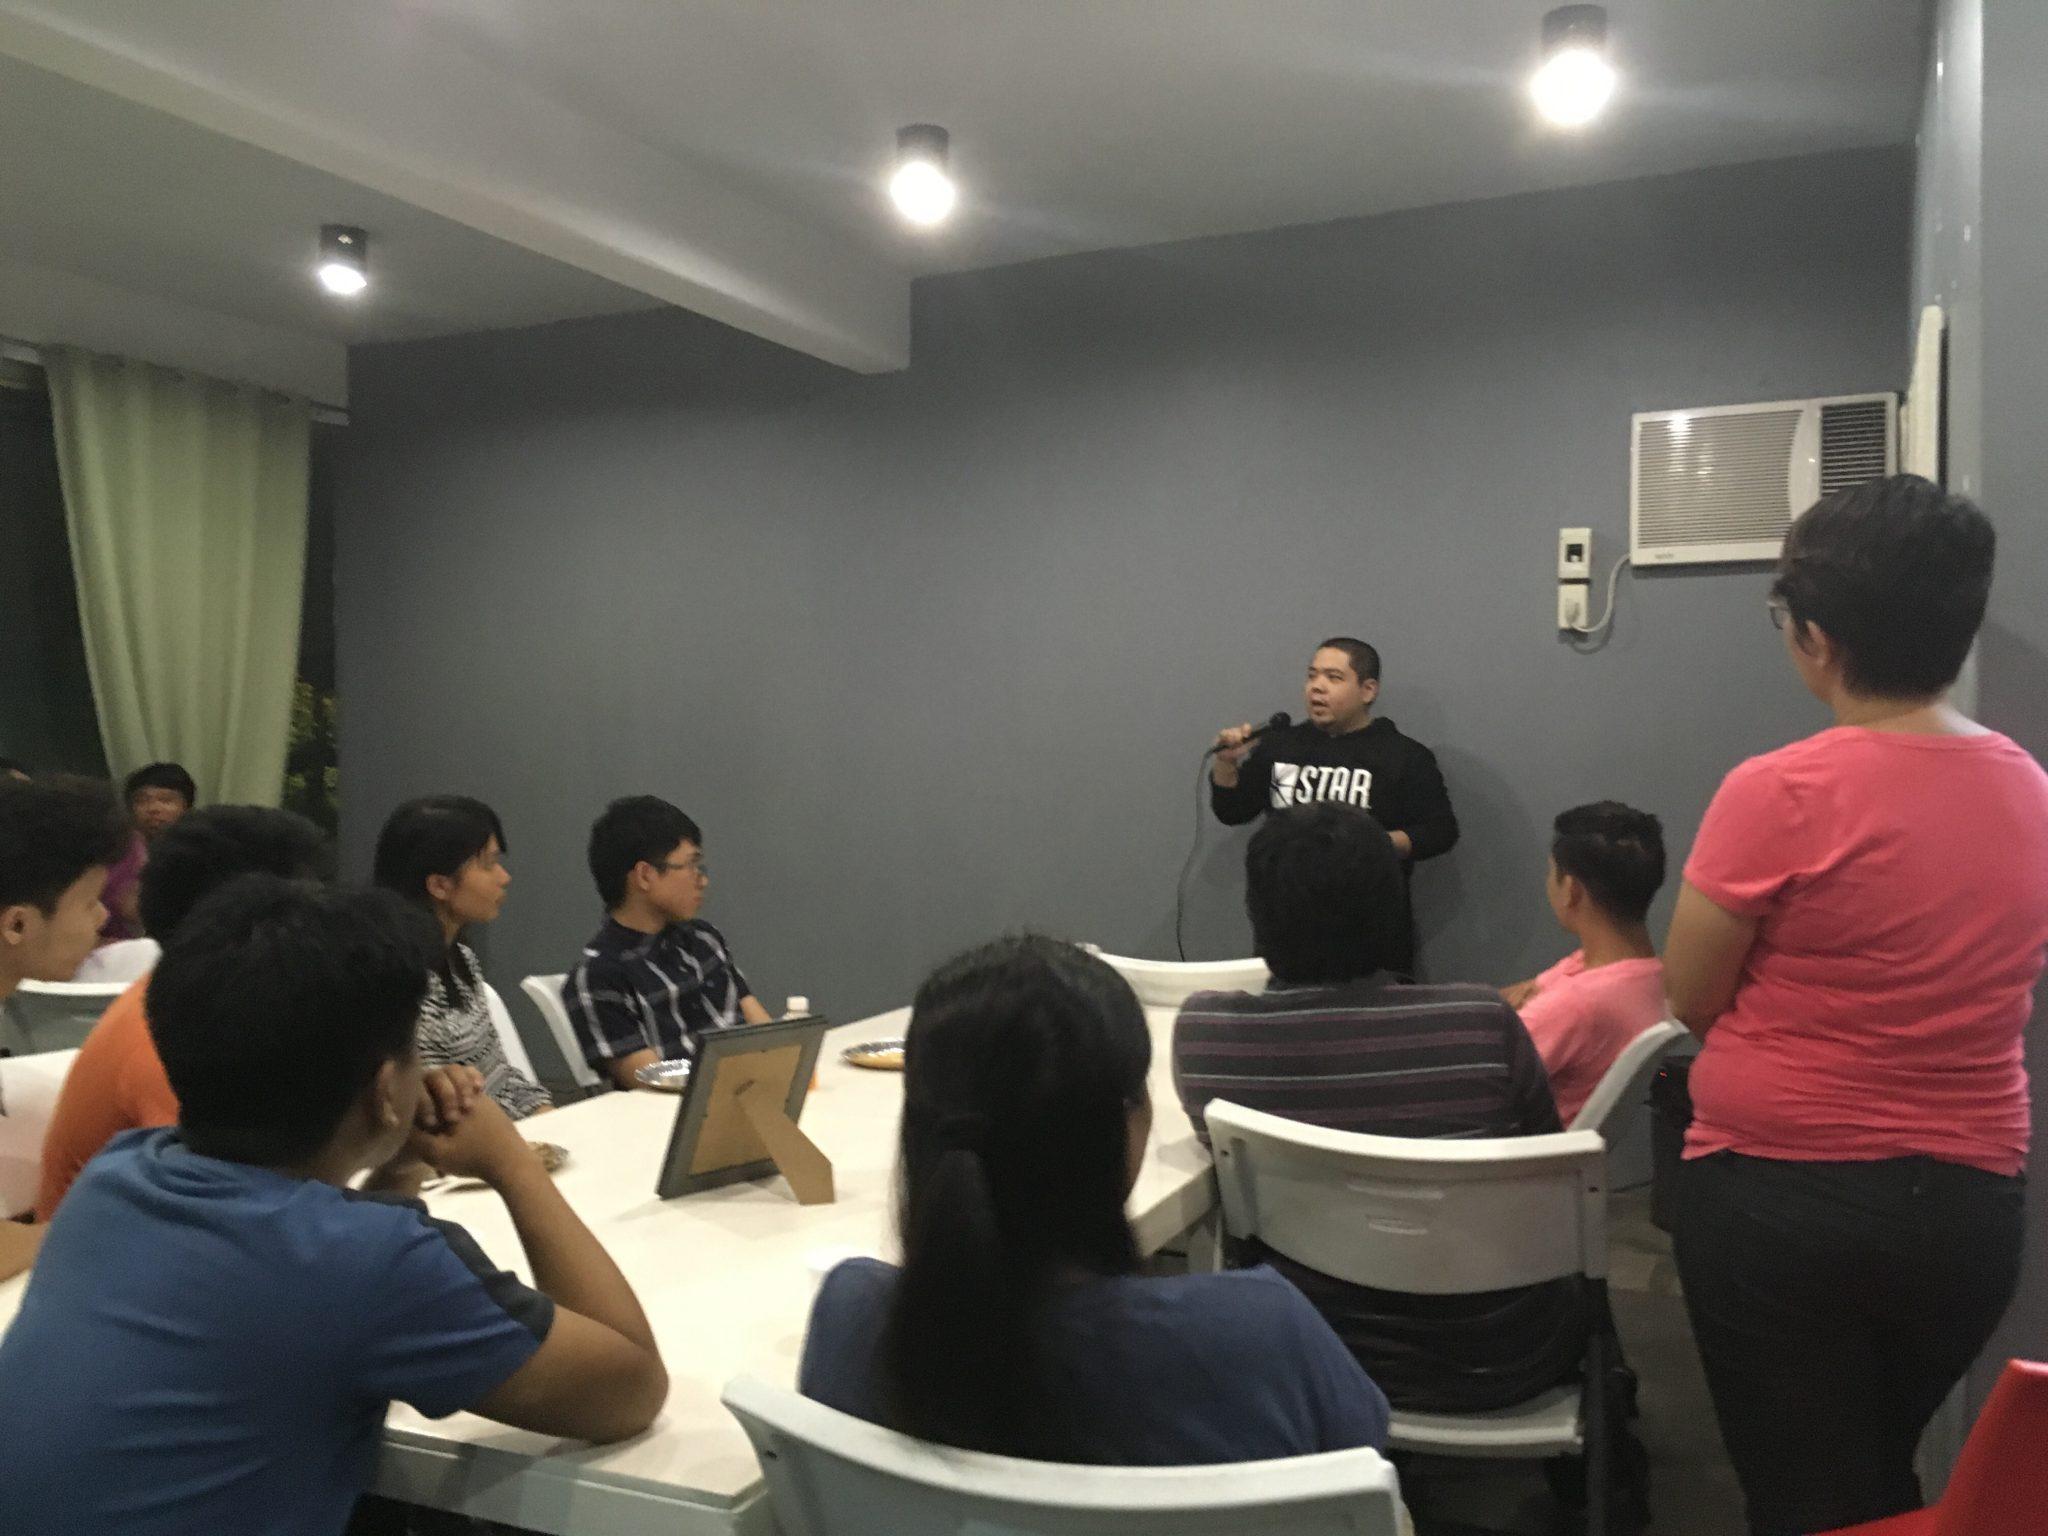 Jingo Rodriguez, DevCon Iloilo Chapter Head on Intro to DevCon and its activities in Iloilo